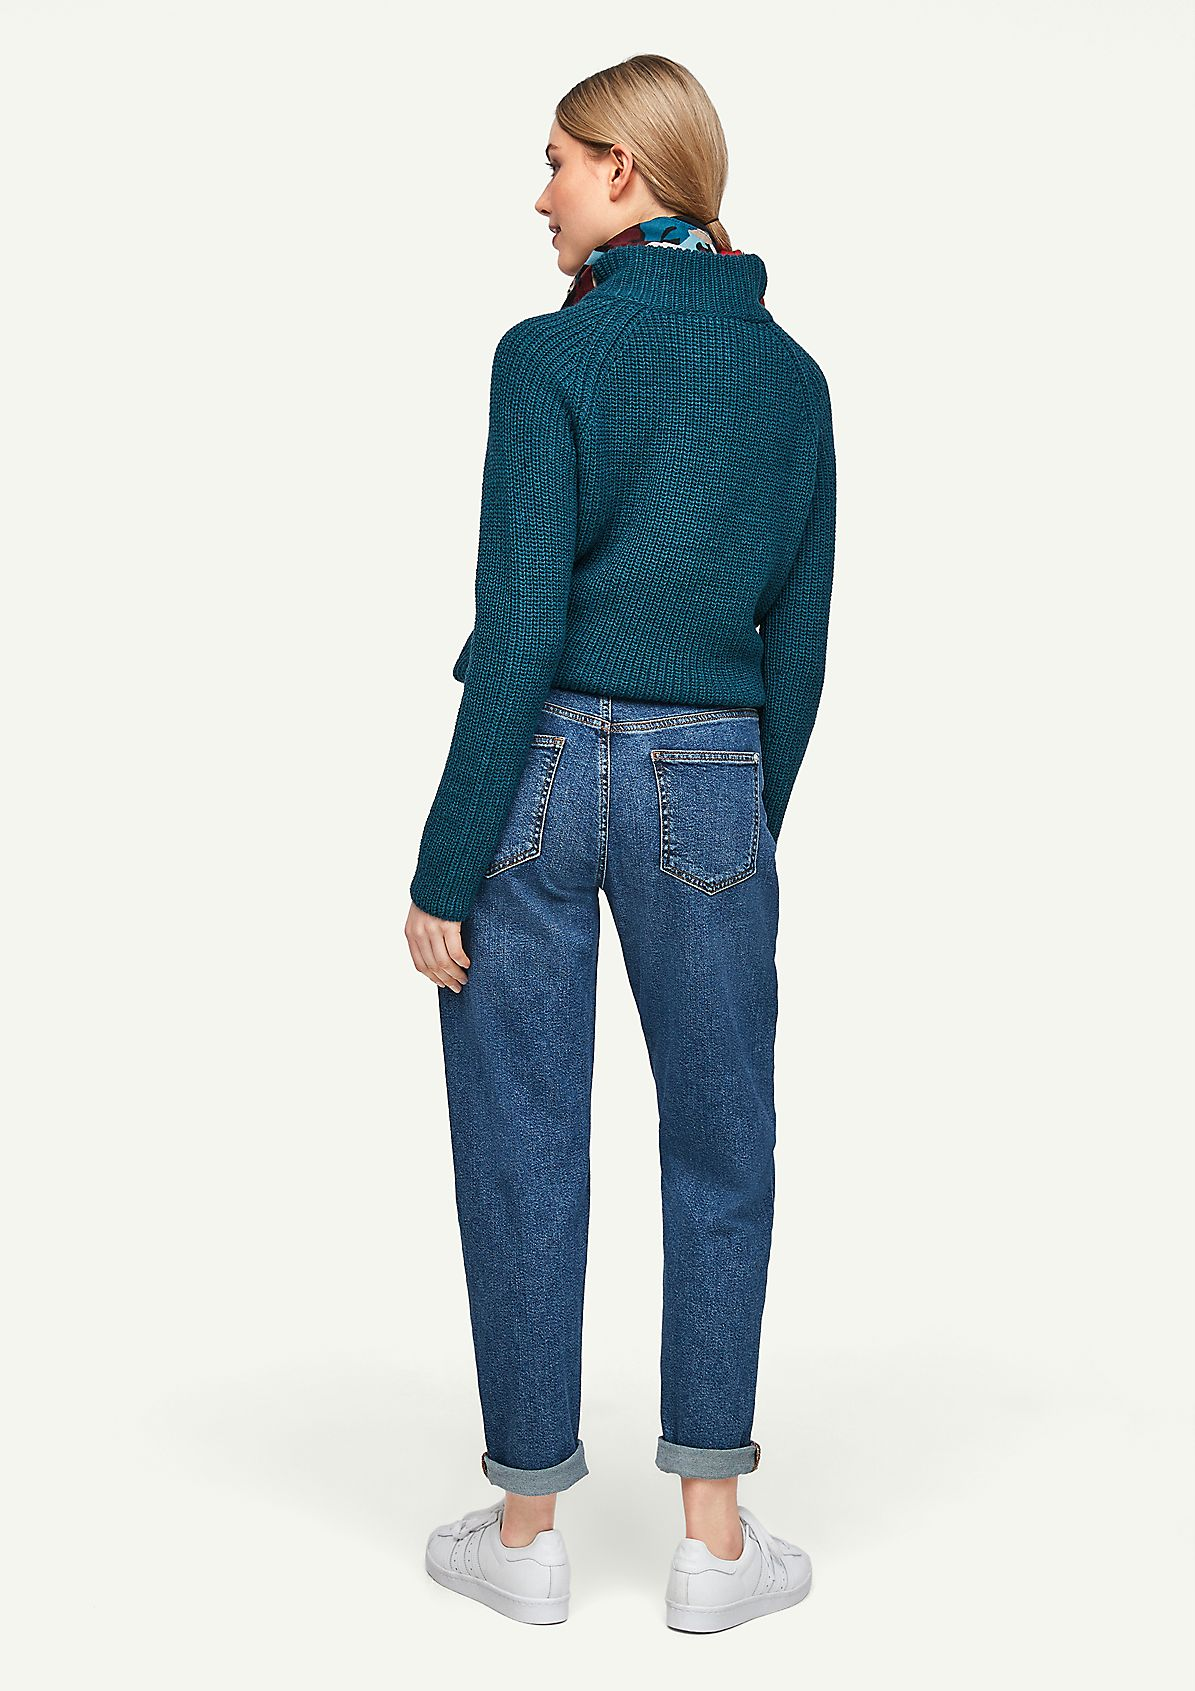 Regular Fit: Straight leg-Jeans